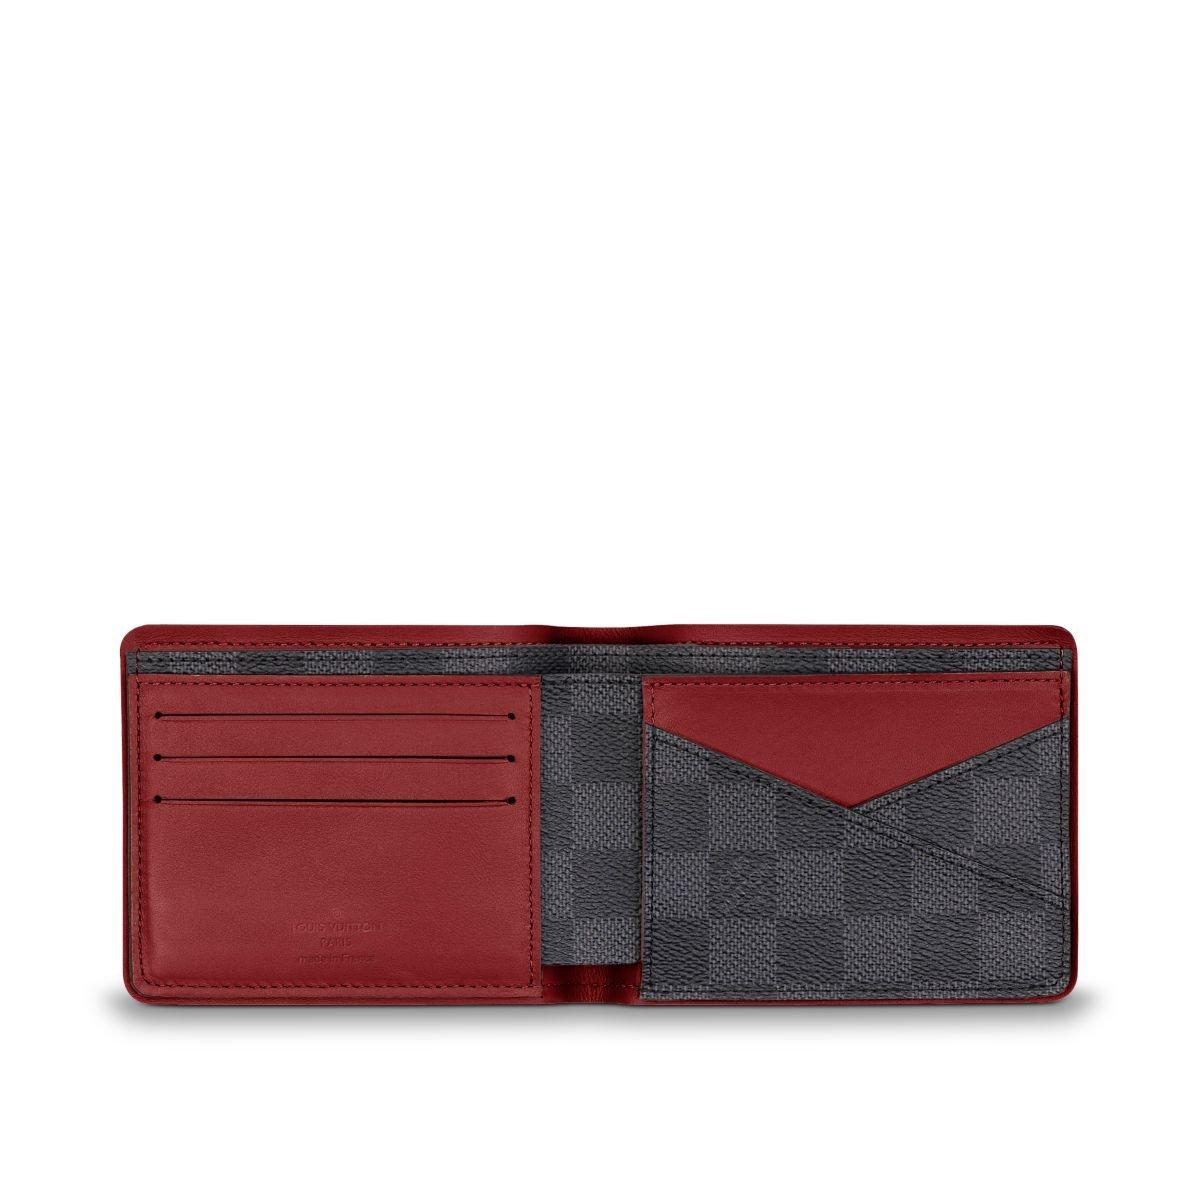 daf72de4b5d3 Louis vuitton Multiple Wallet in Purple for Men